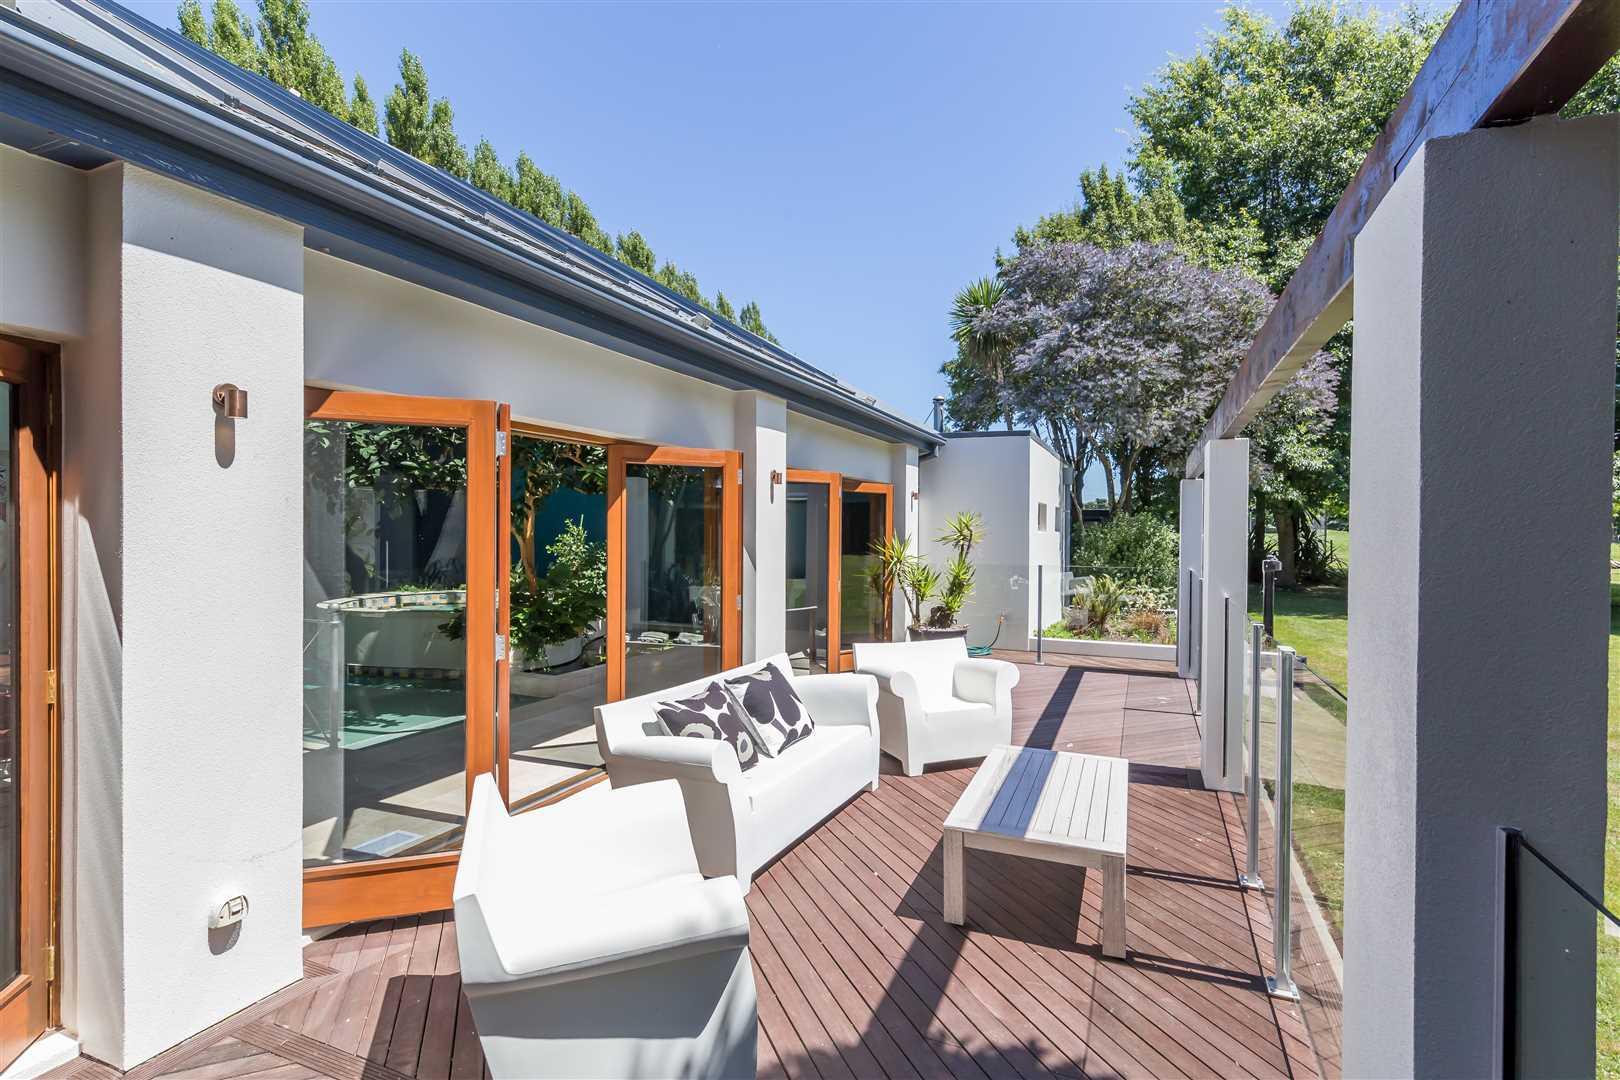 Wonderful outdoor living adjoins the pool room